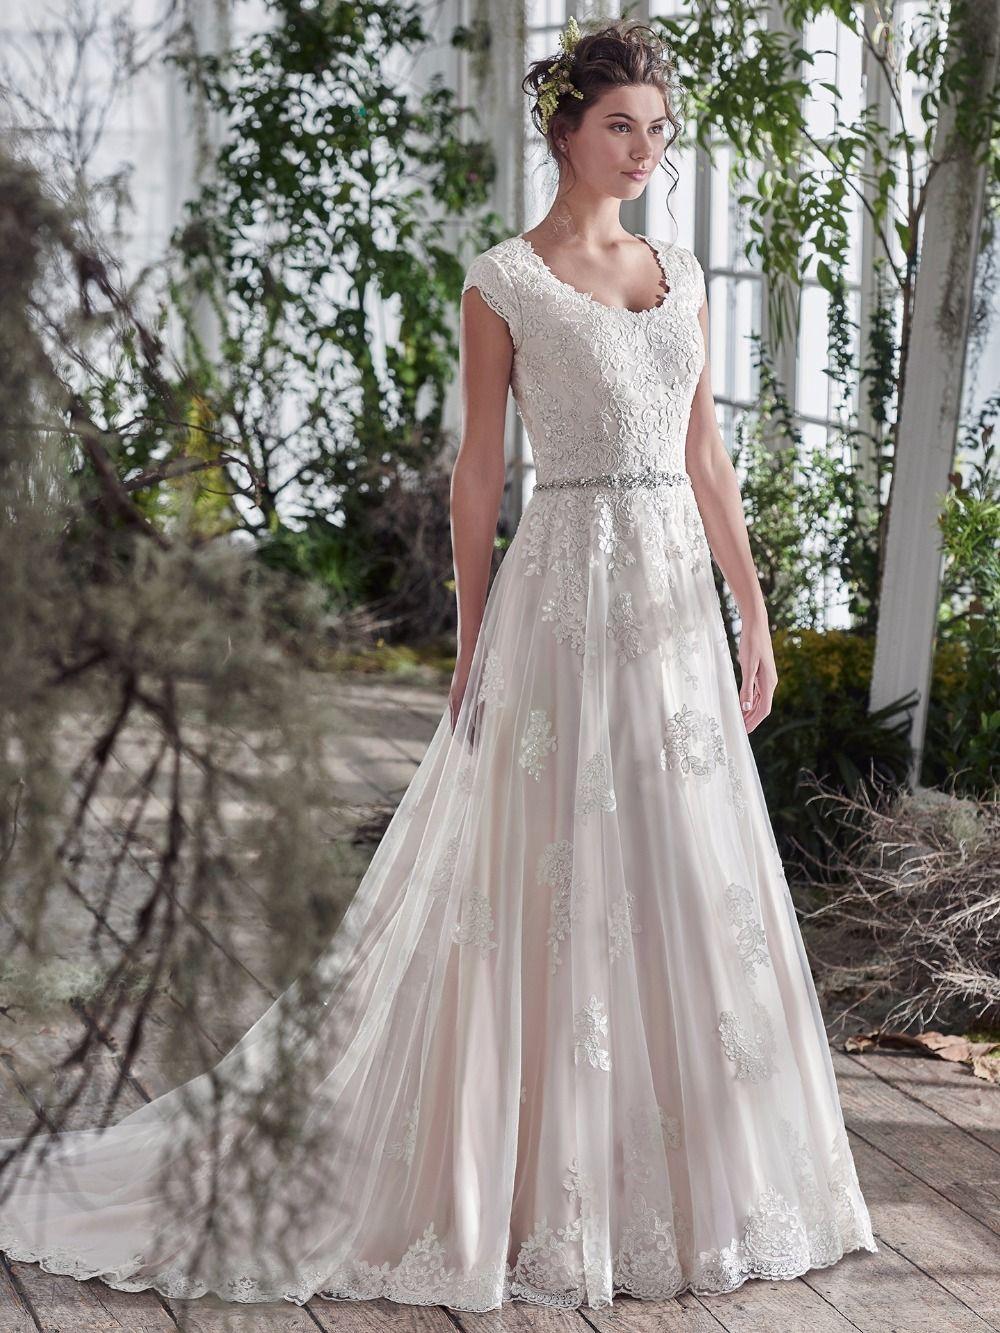 Lace cap sleeve a line wedding dress  Click to Buy ucuc Vintage Lace Appliques Aline Modest Wedding Dresses